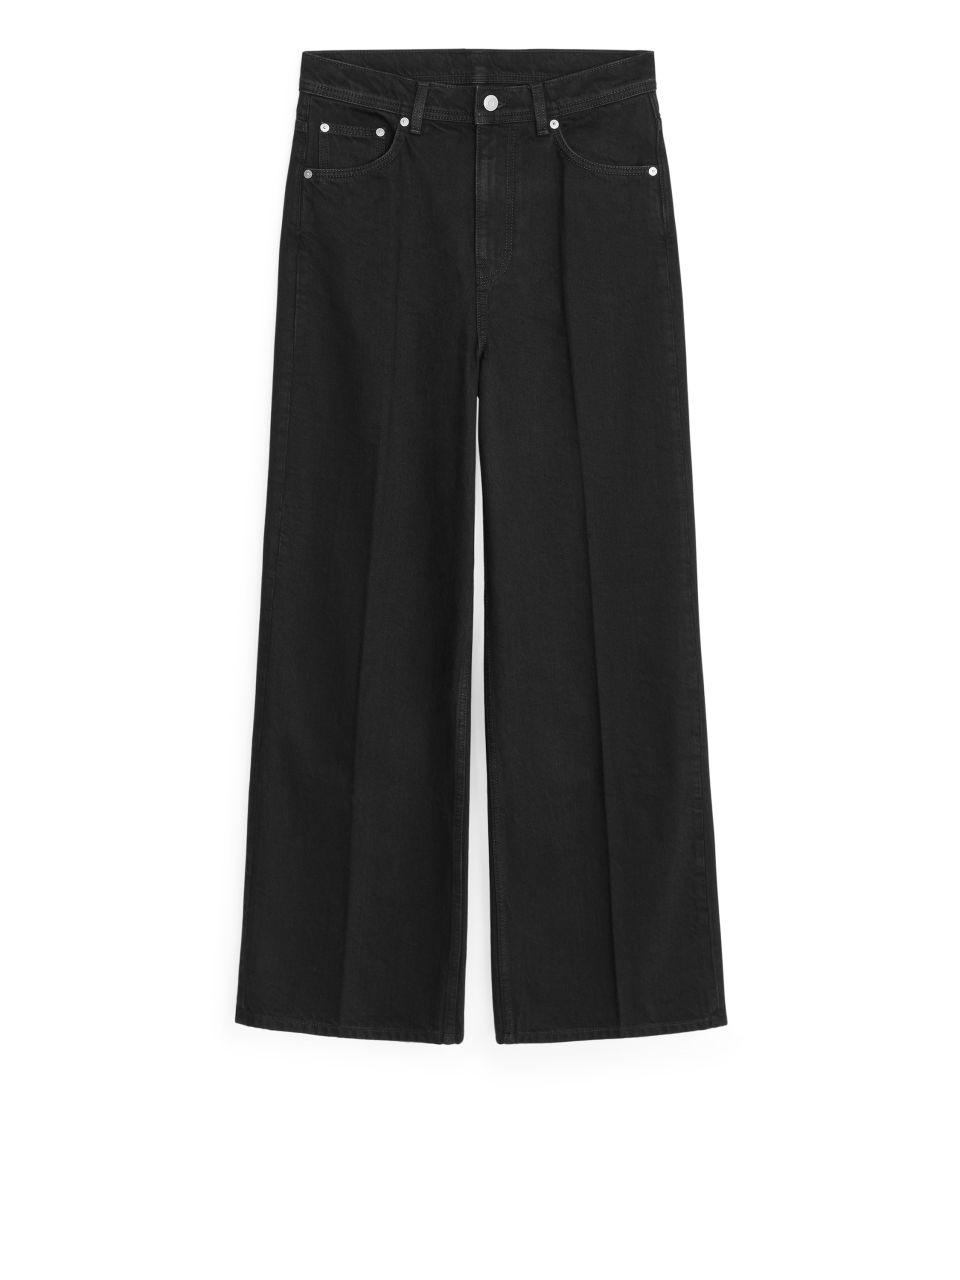 WIDE Jeans - Black